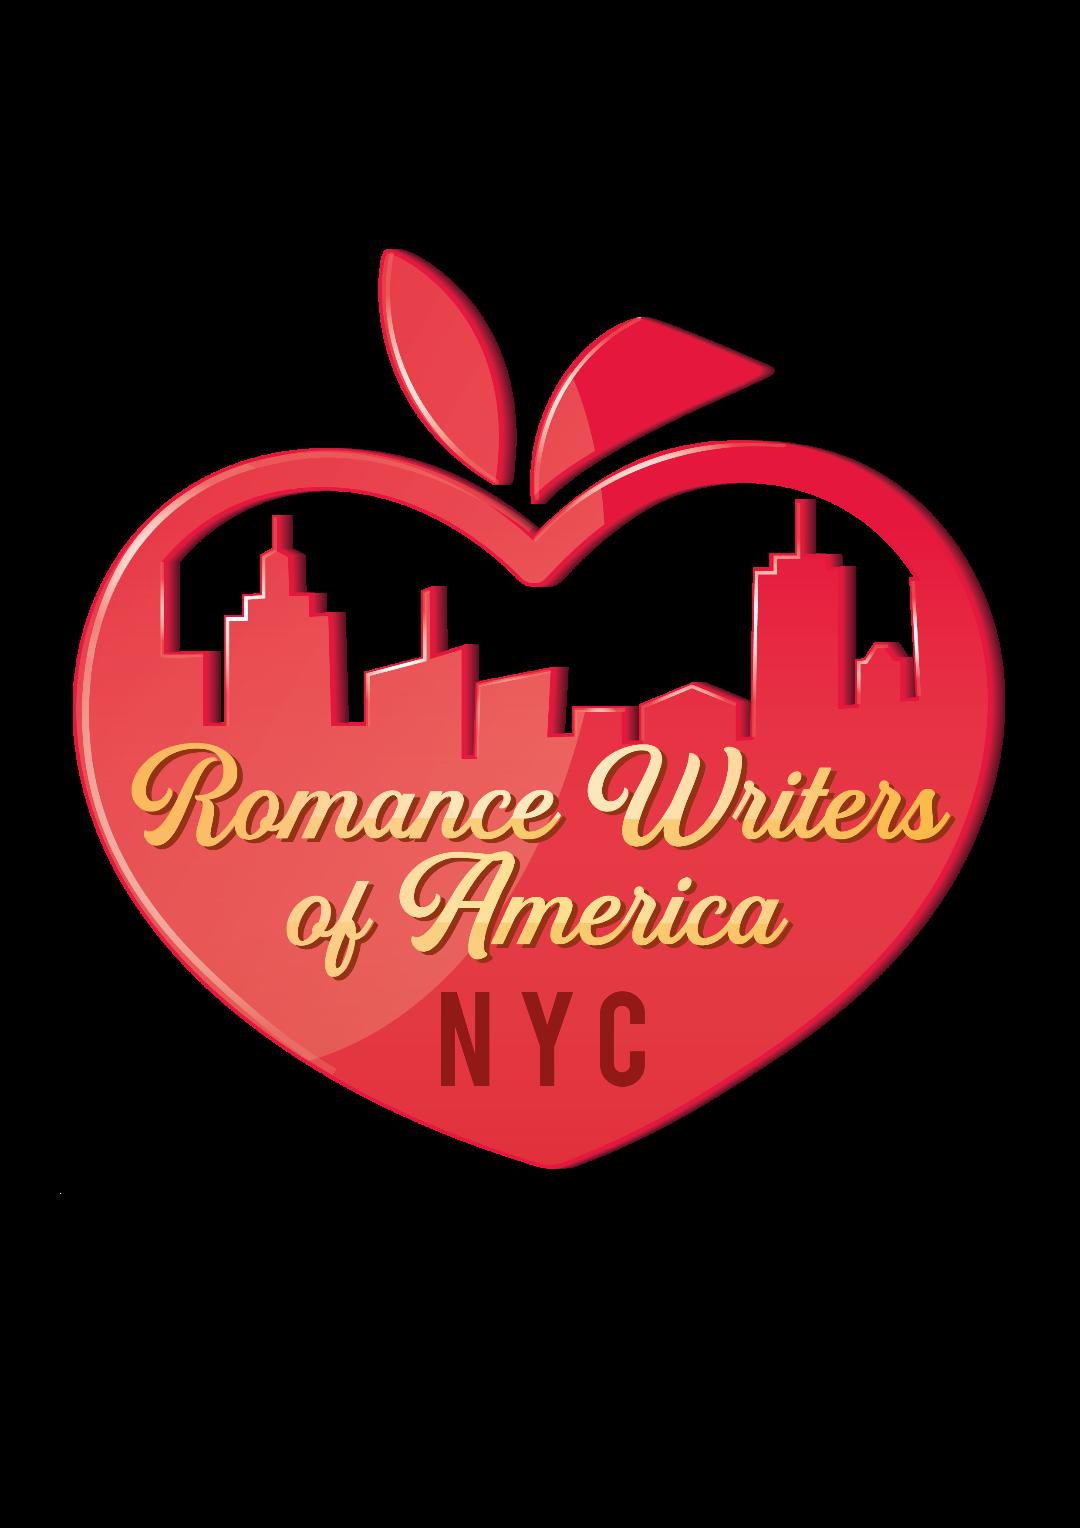 Romance Writers of America New York City, Inc.